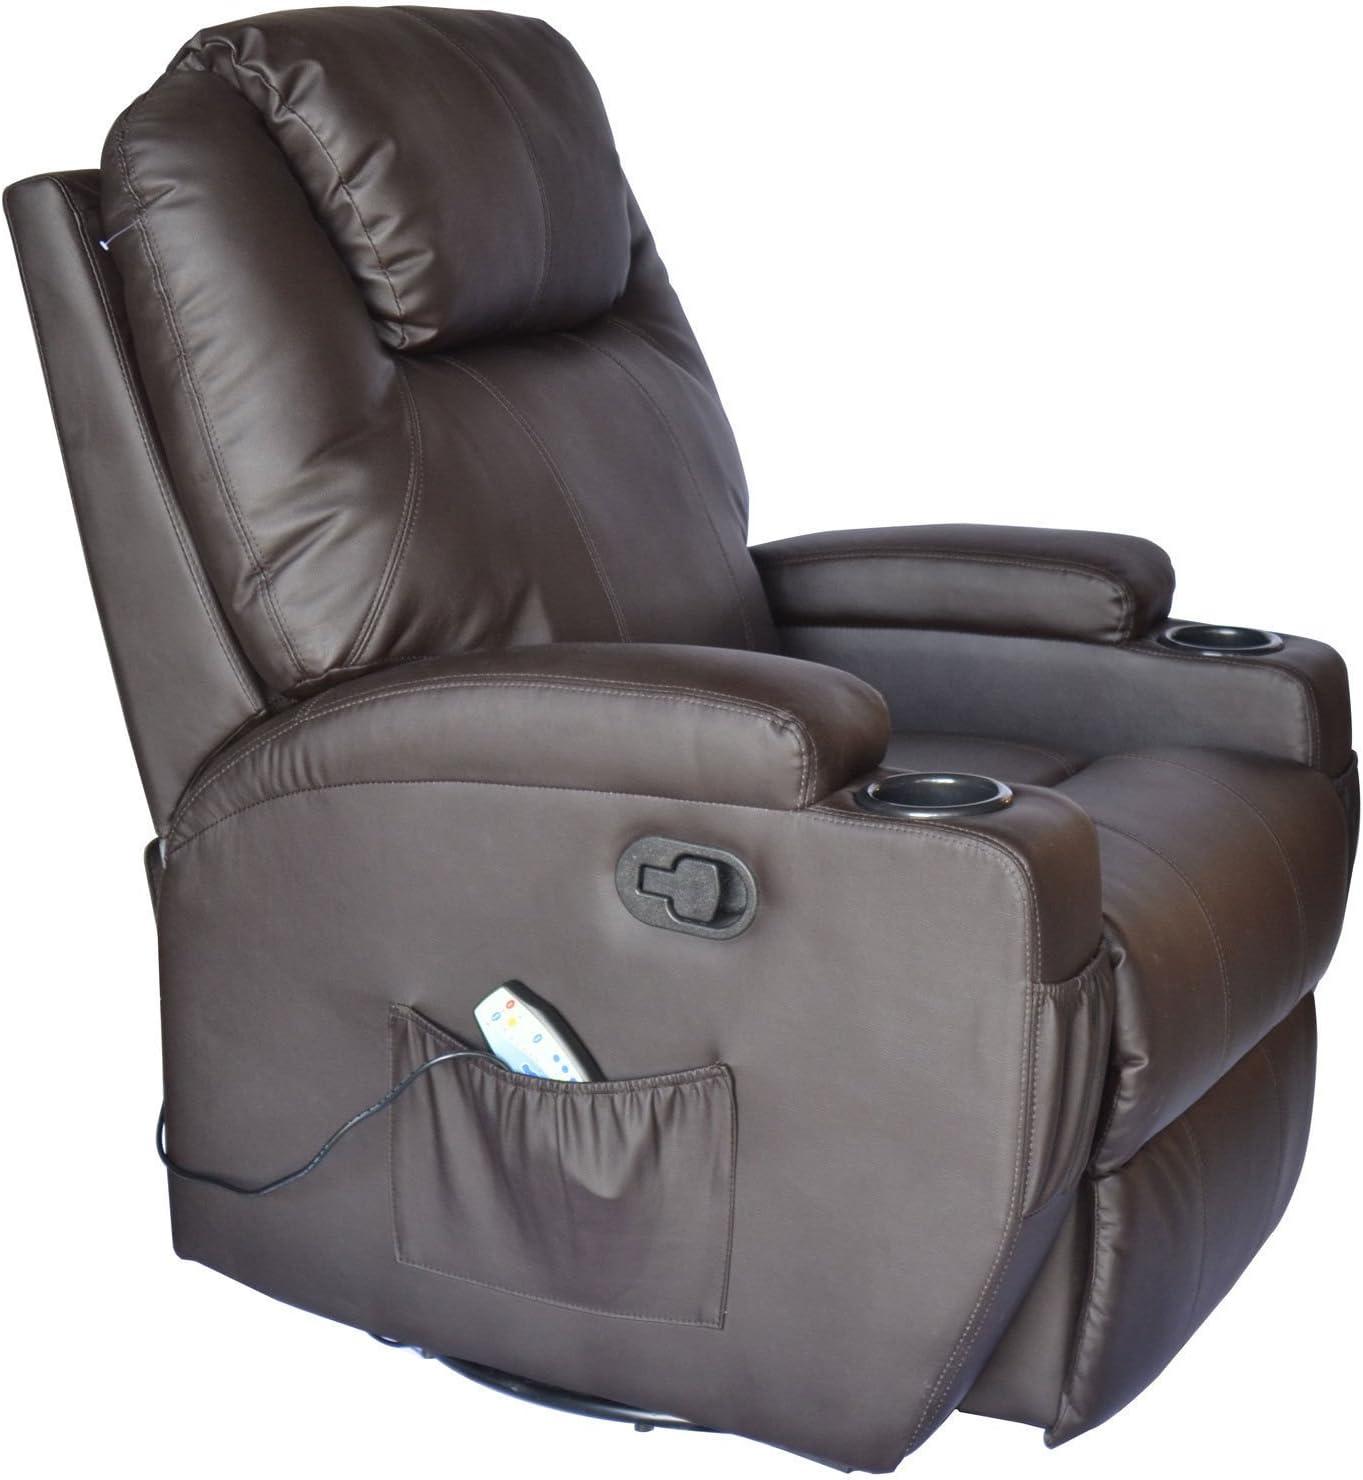 Homcom PU Leather Padded Recliner elegant design